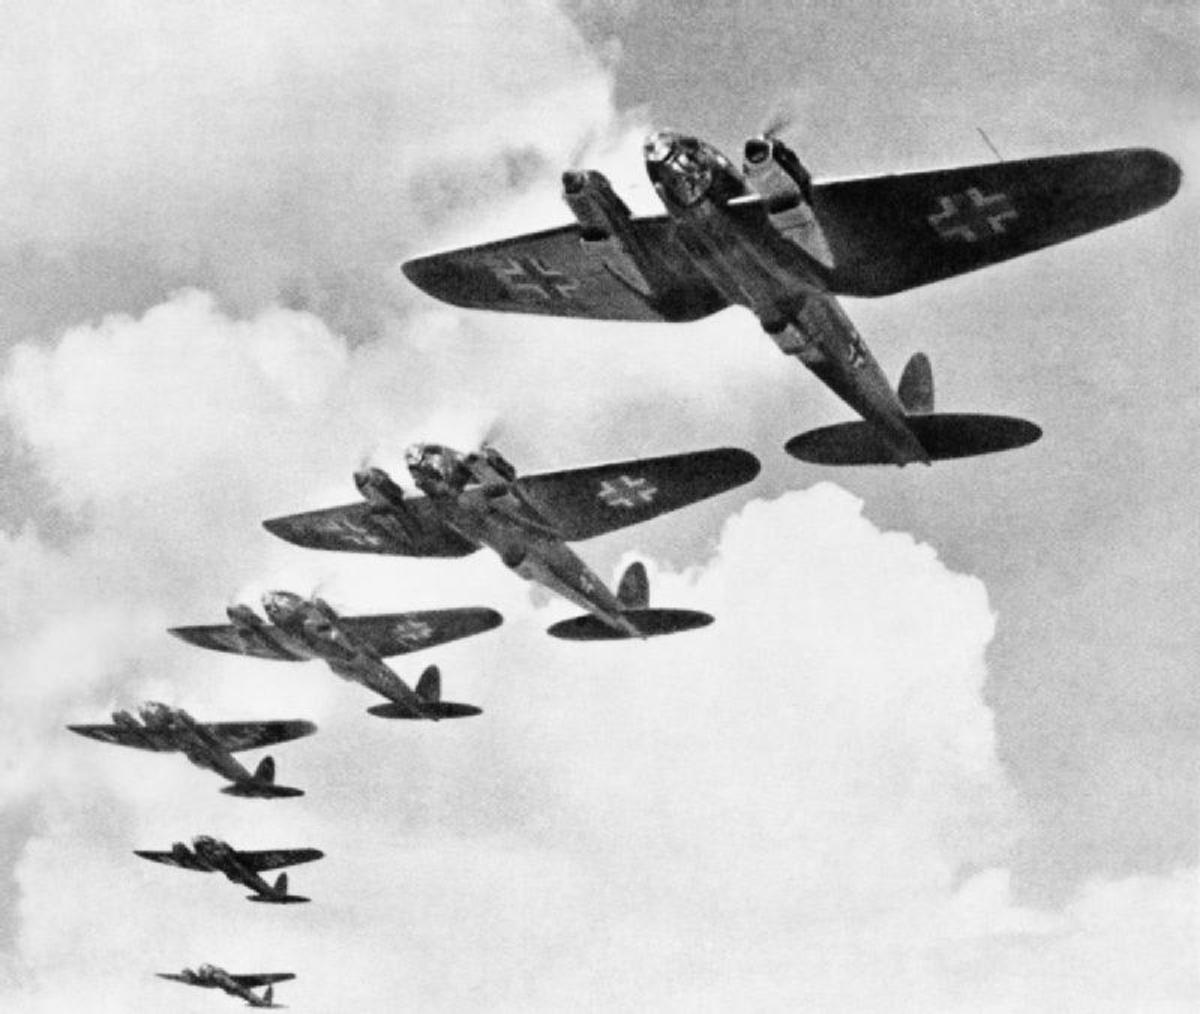 Heinkel He 111s were used to carpet bomb Stalingrad.